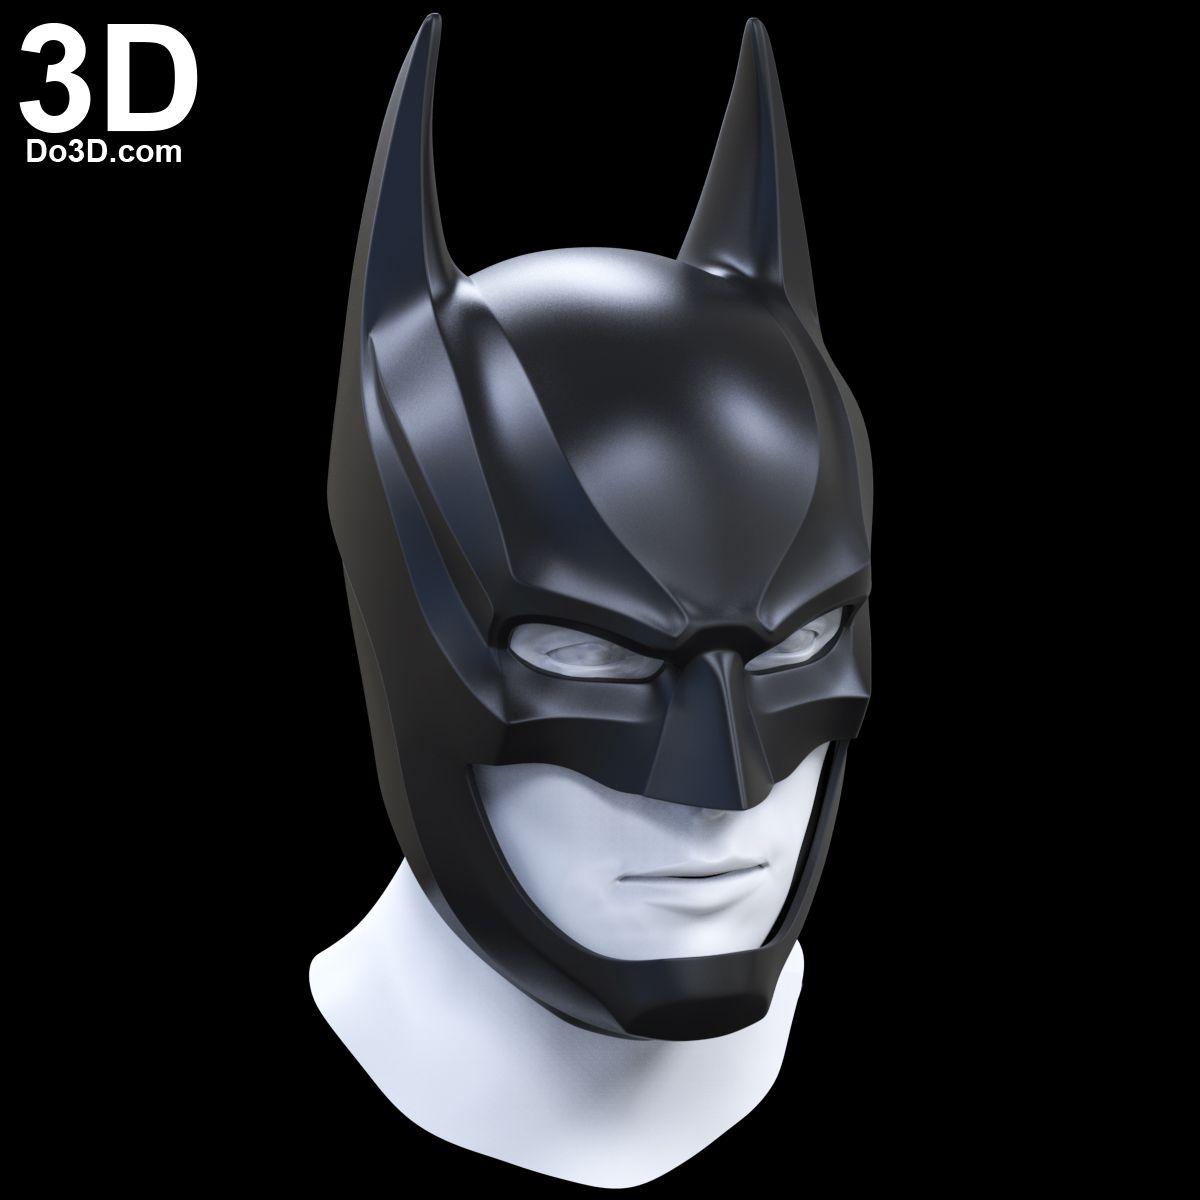 3D Printable Model: Batman Injustice 2 Helmet Cowl | Print File ...